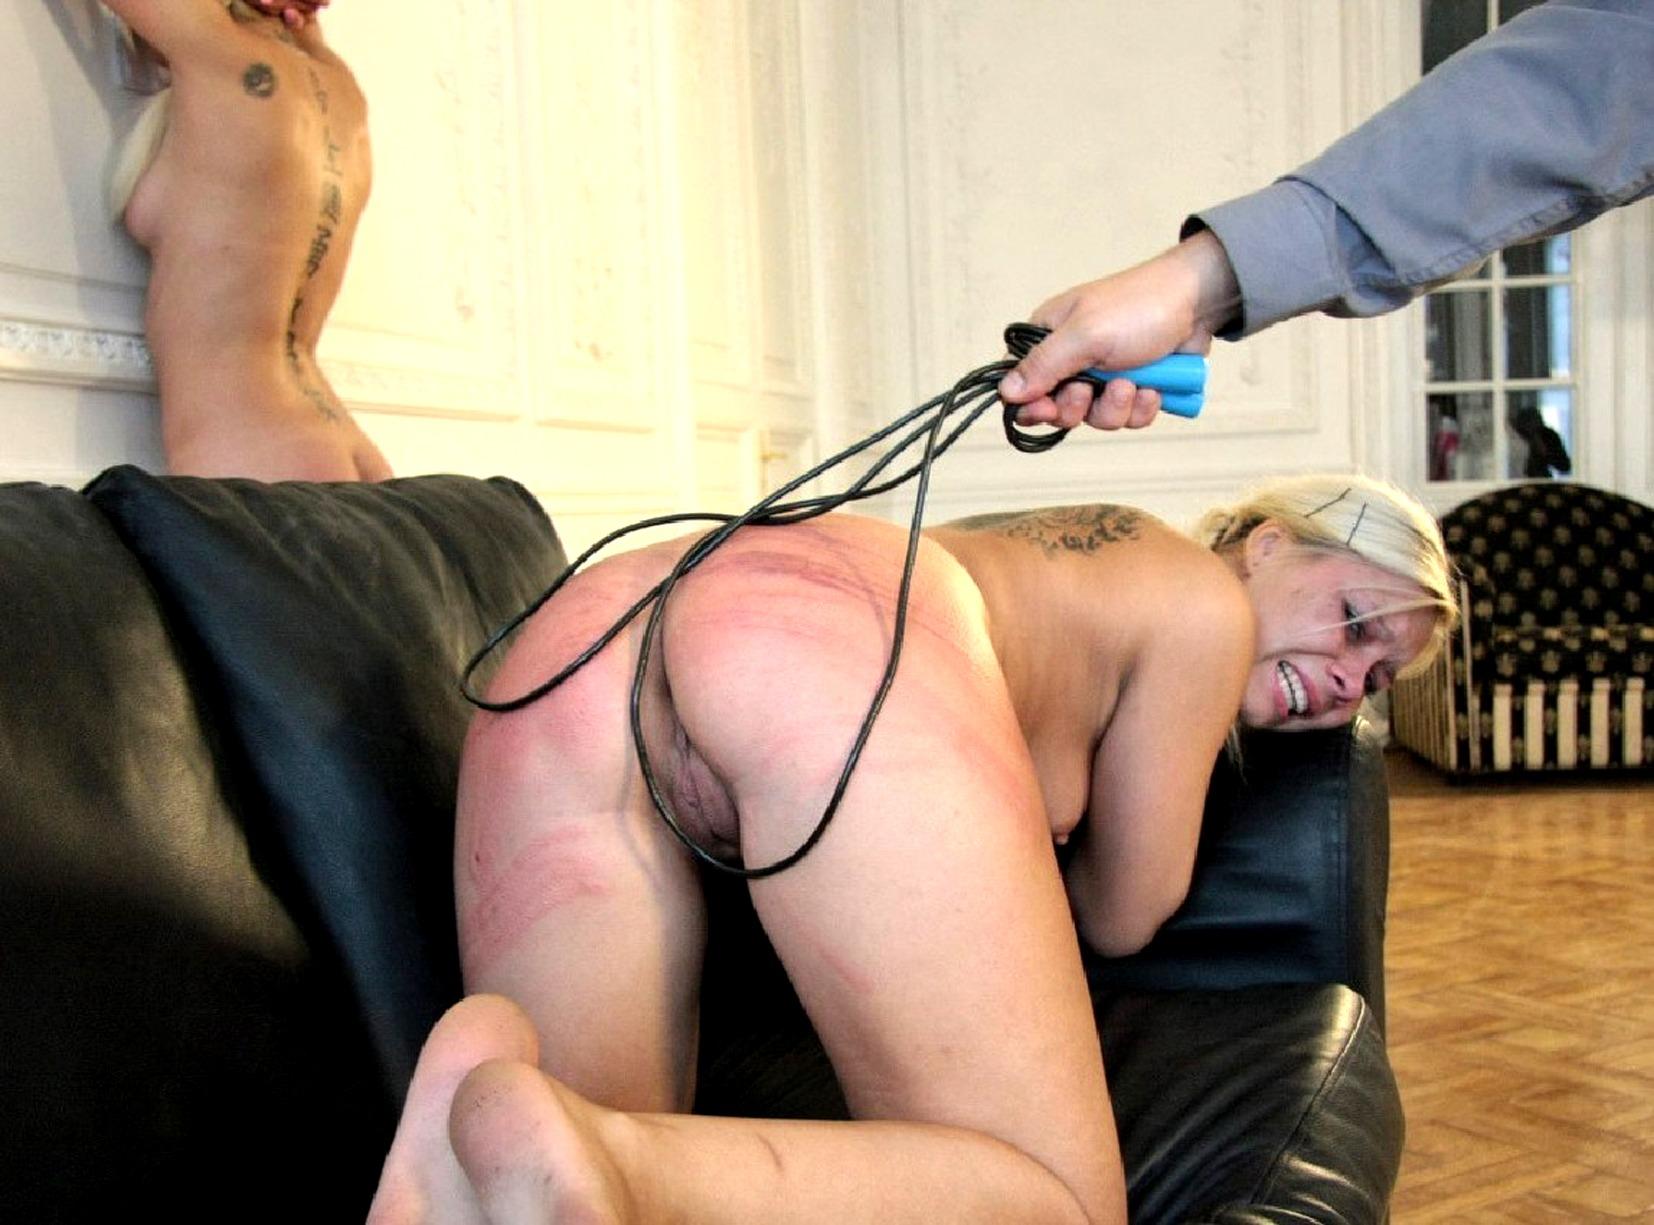 Наказание девушек порно видео онлайн